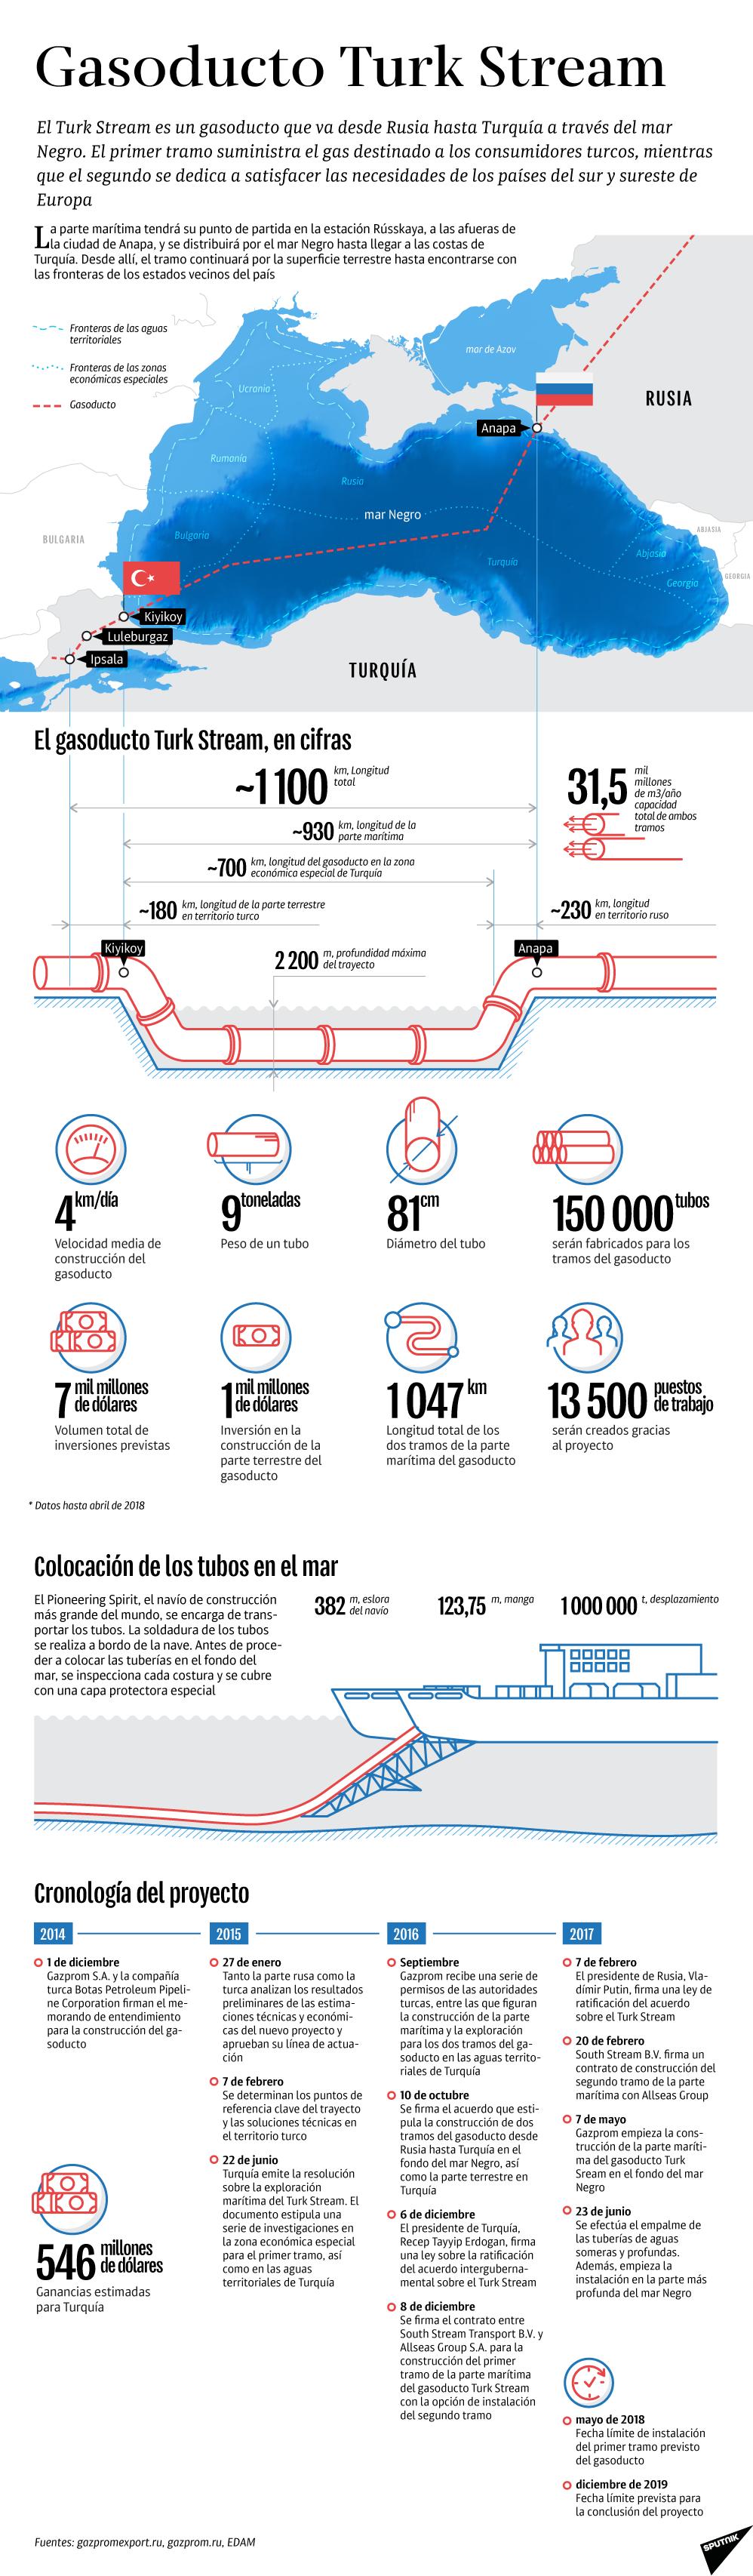 Gasoducto Turk Stream